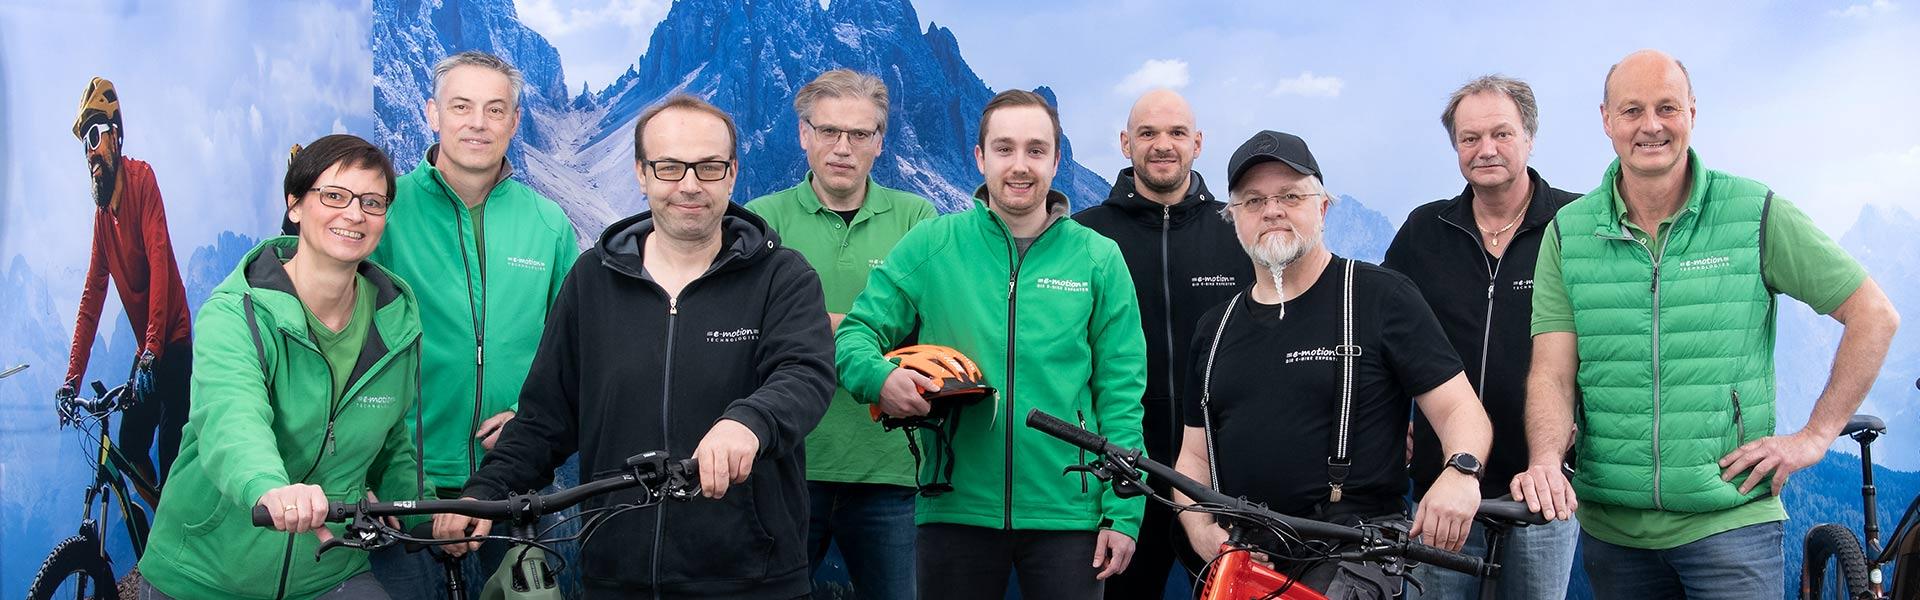 Team der e-motion e-Bike Welt Würzburg Titelbild